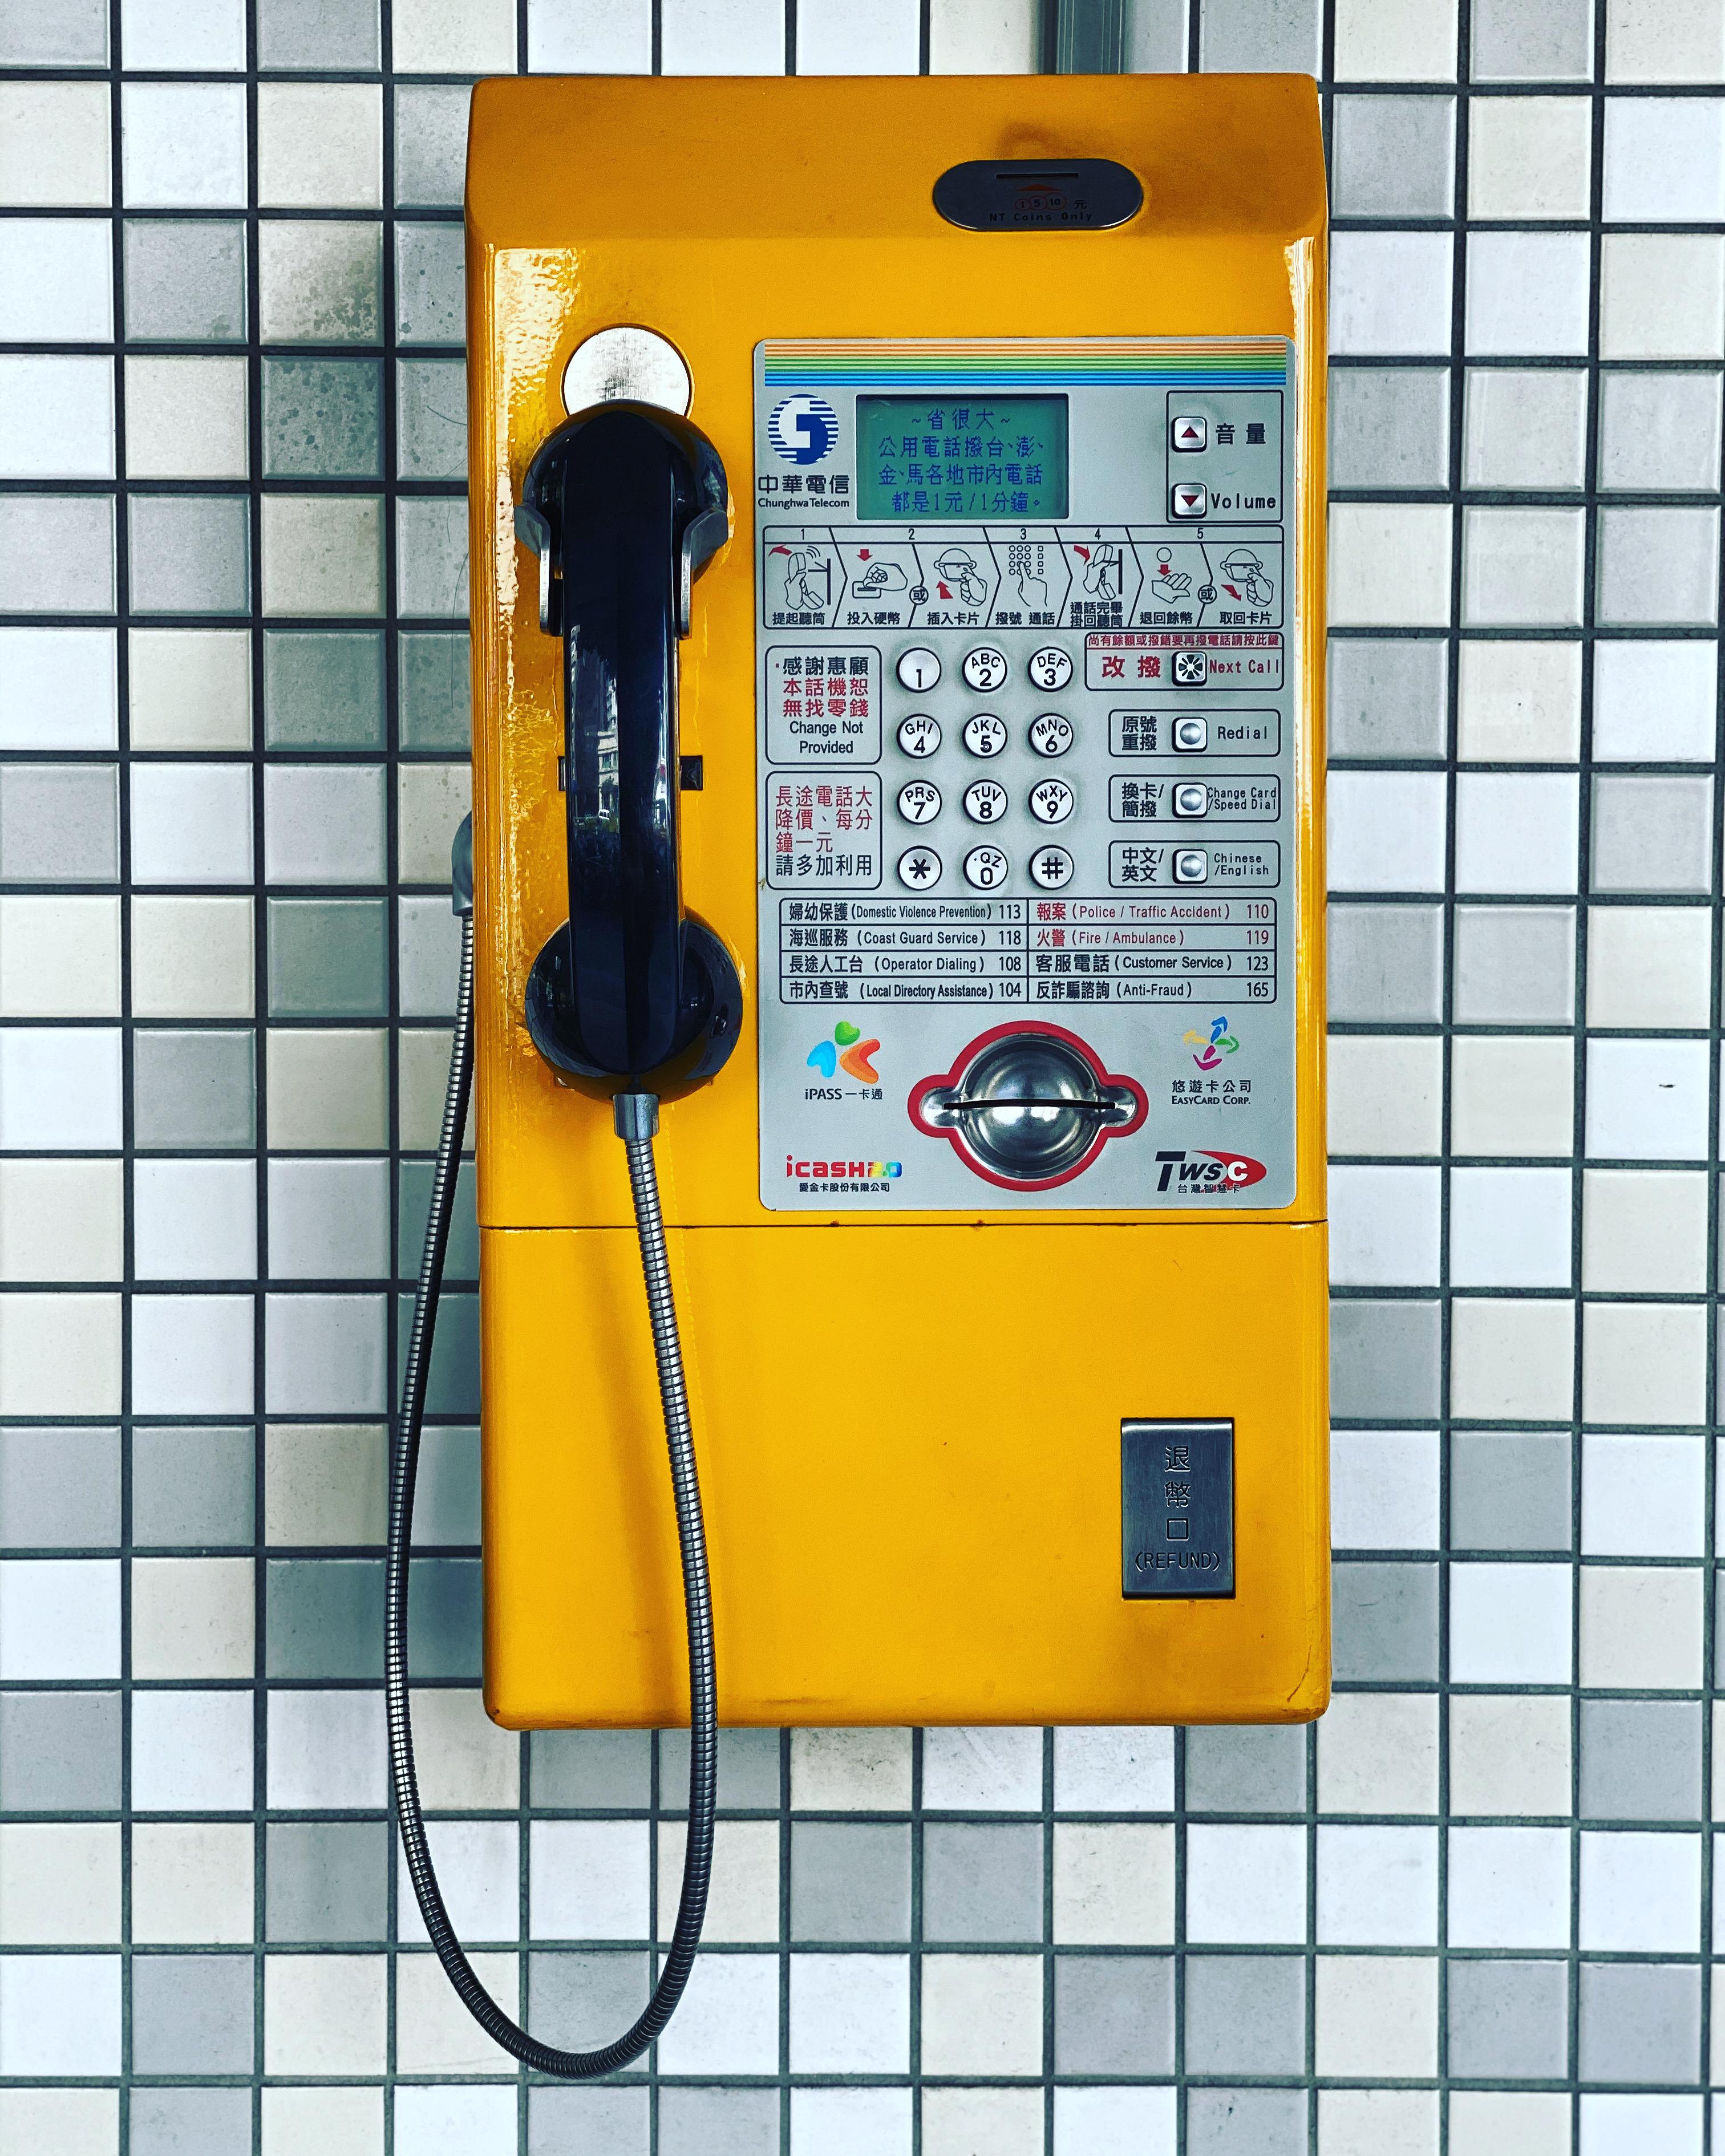 Bright yellow public payphone